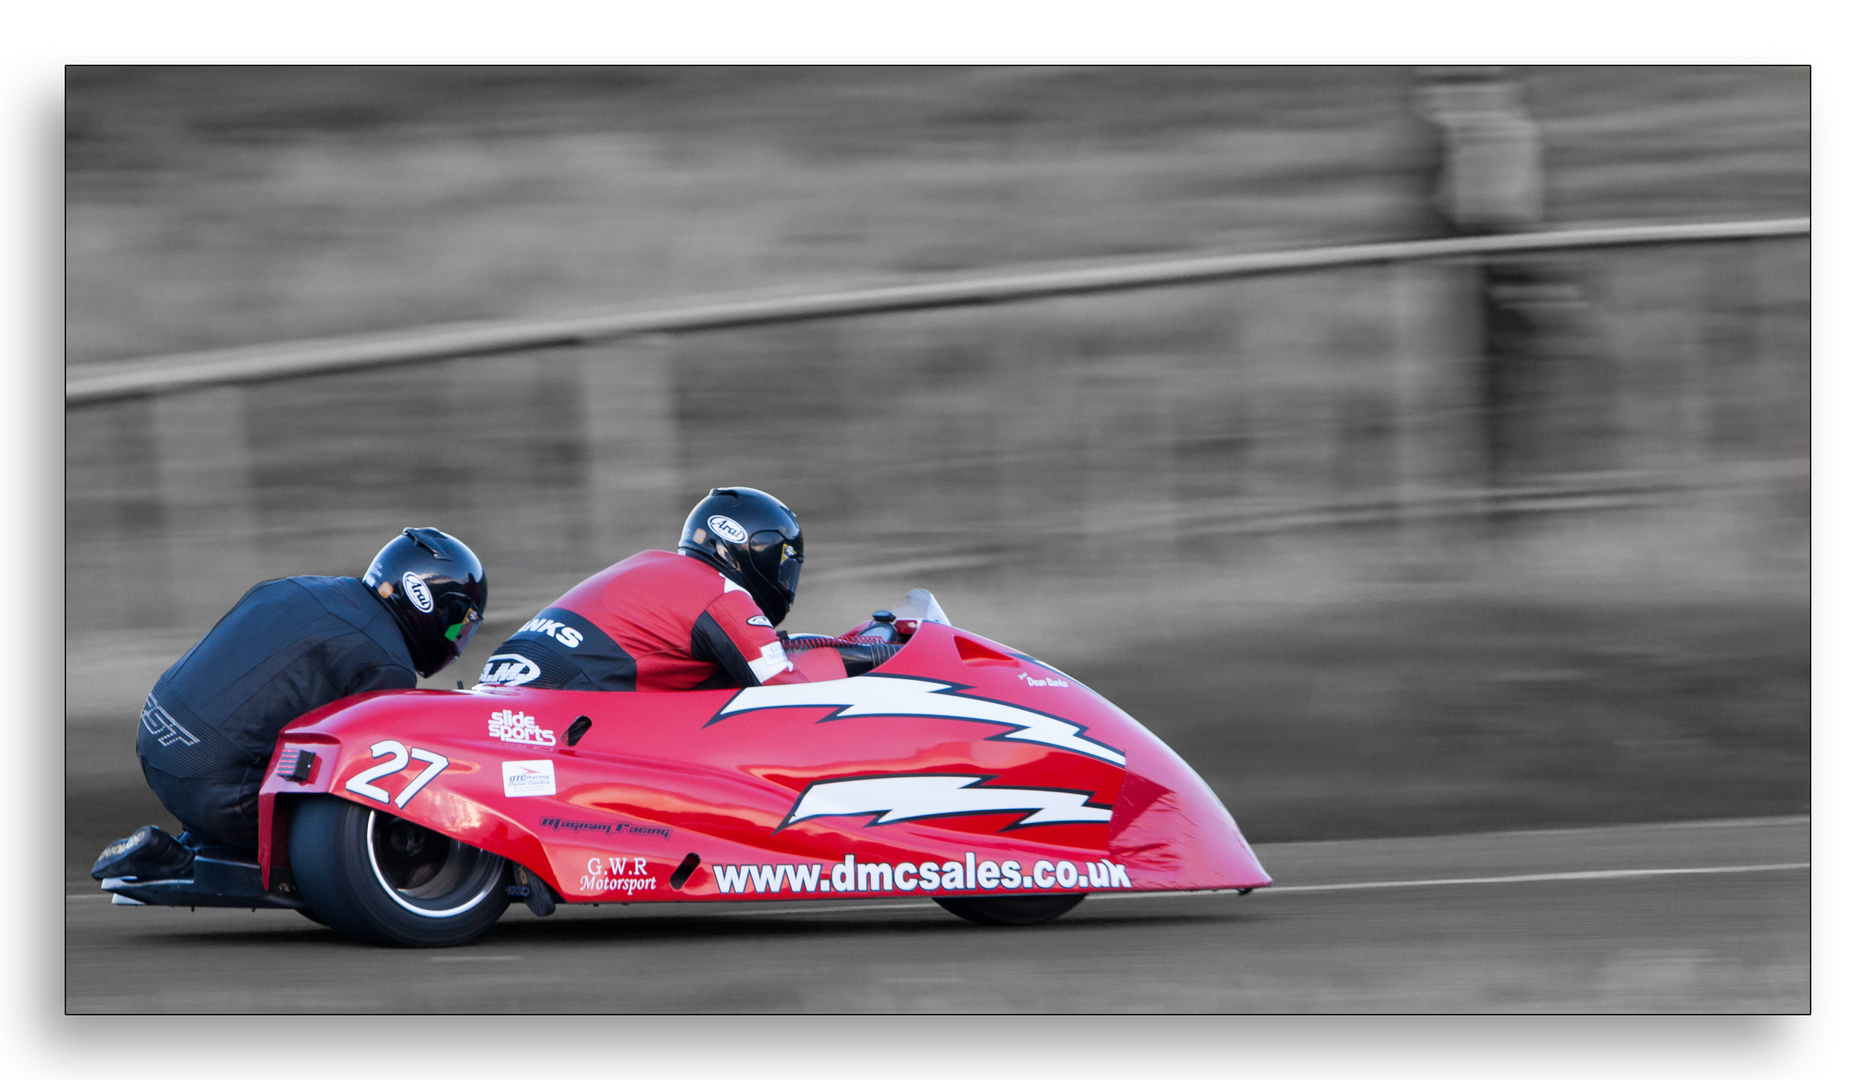 Isle of Man TT 2013